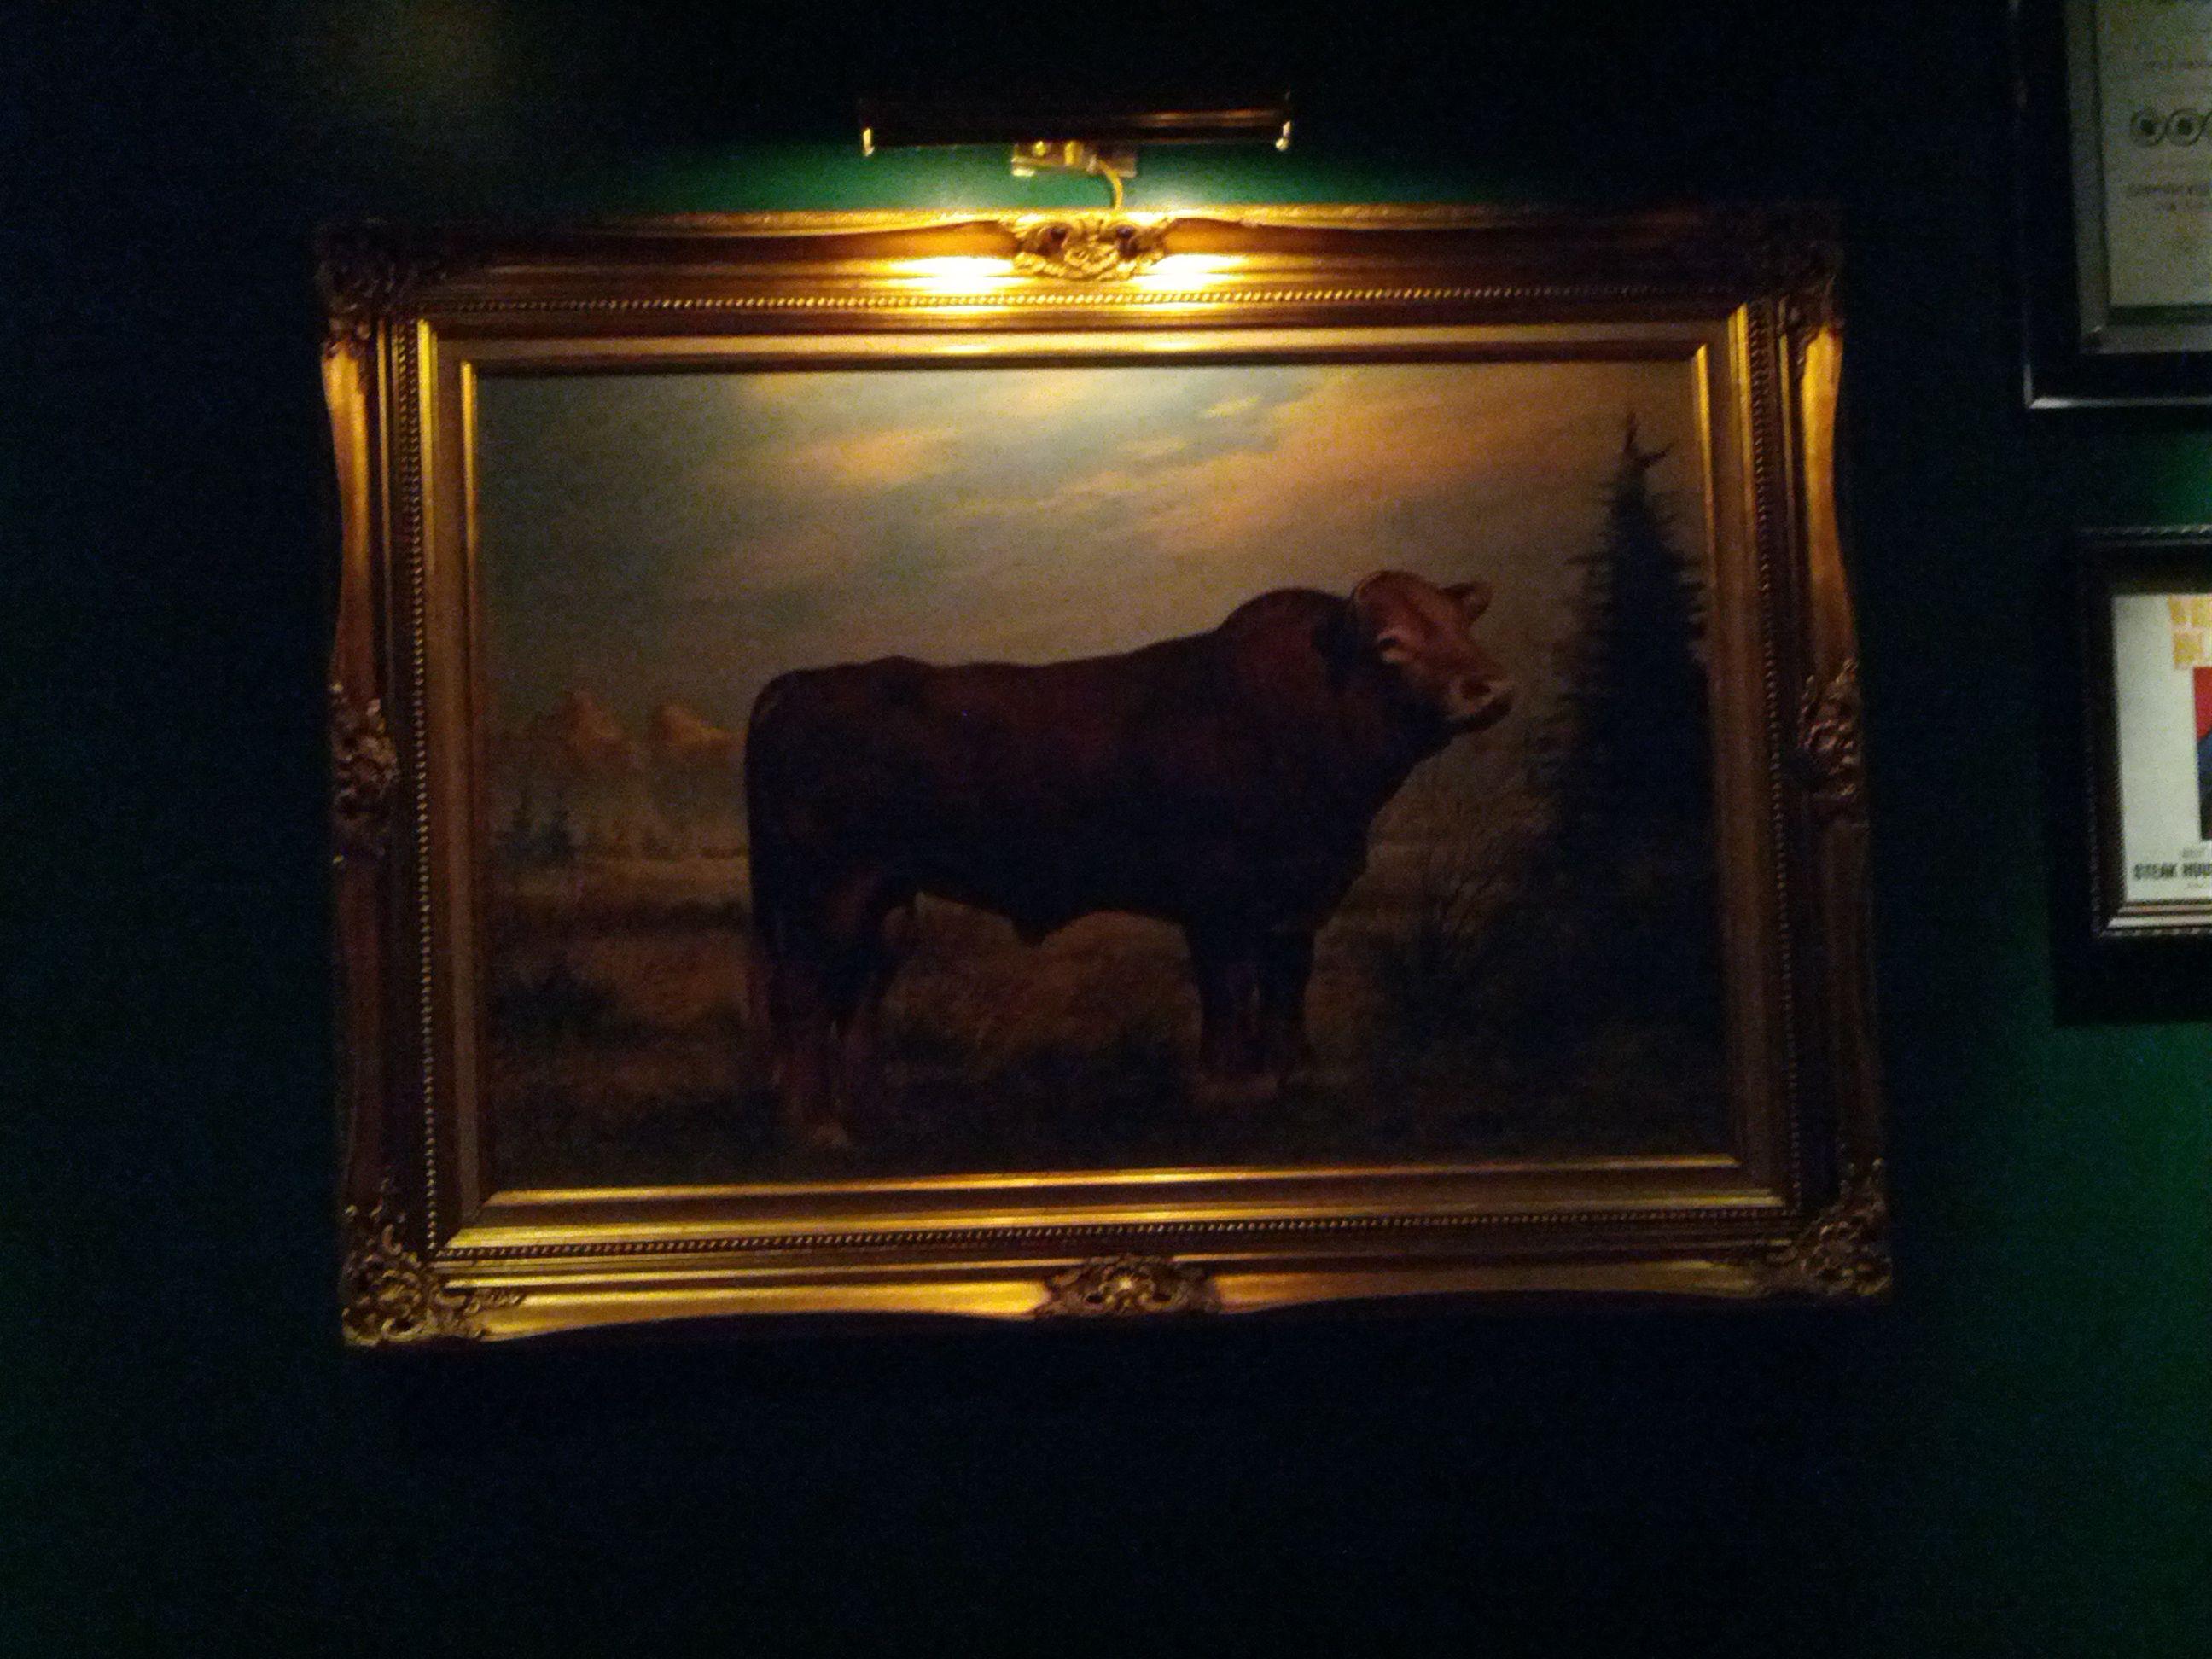 The Steak House art